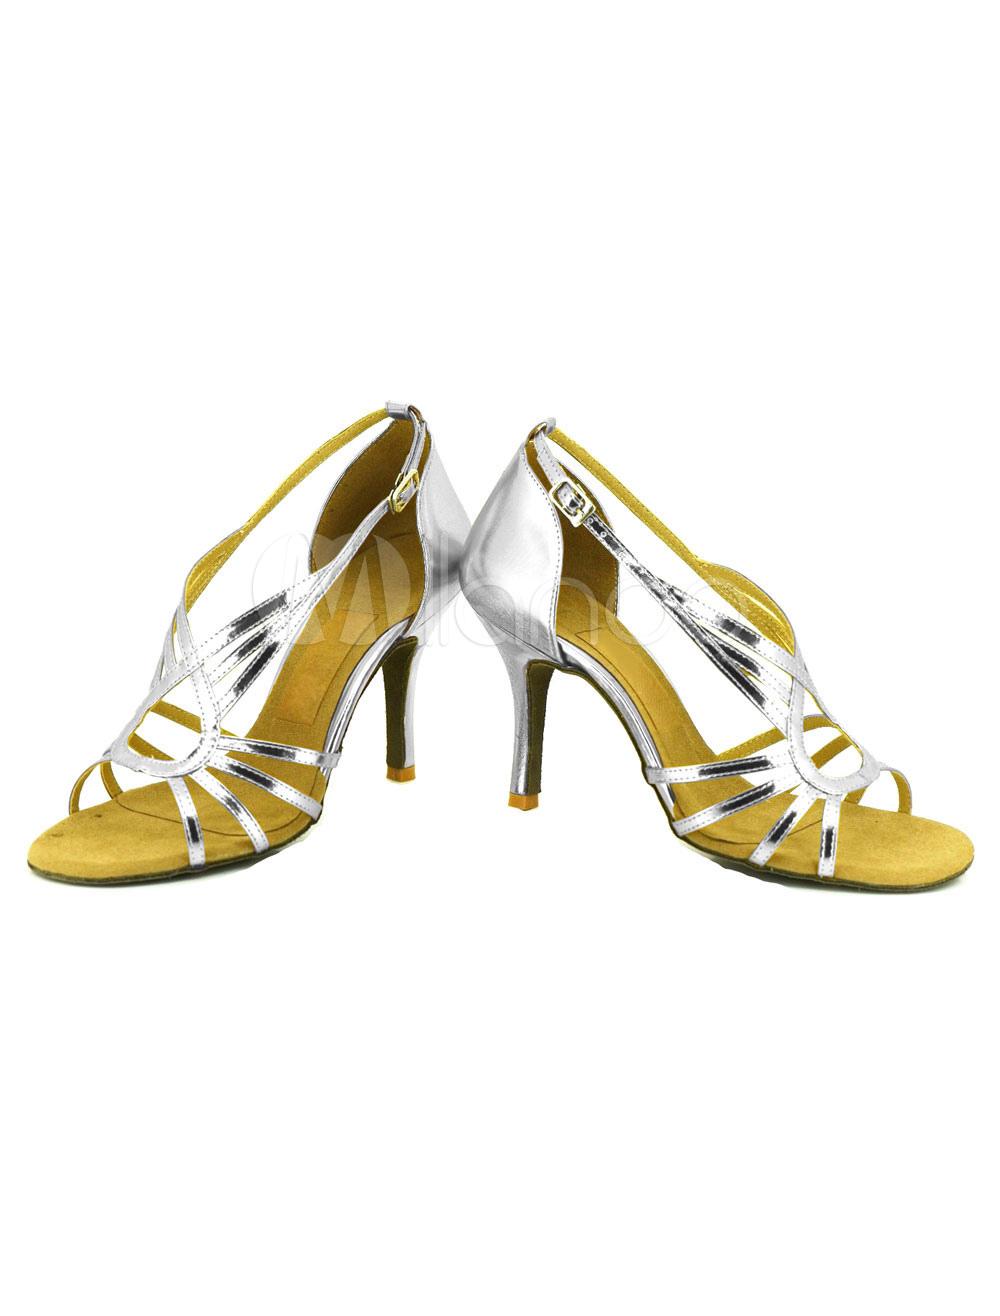 Zapatos de bailes latinos de PU Color liso 2crVmz